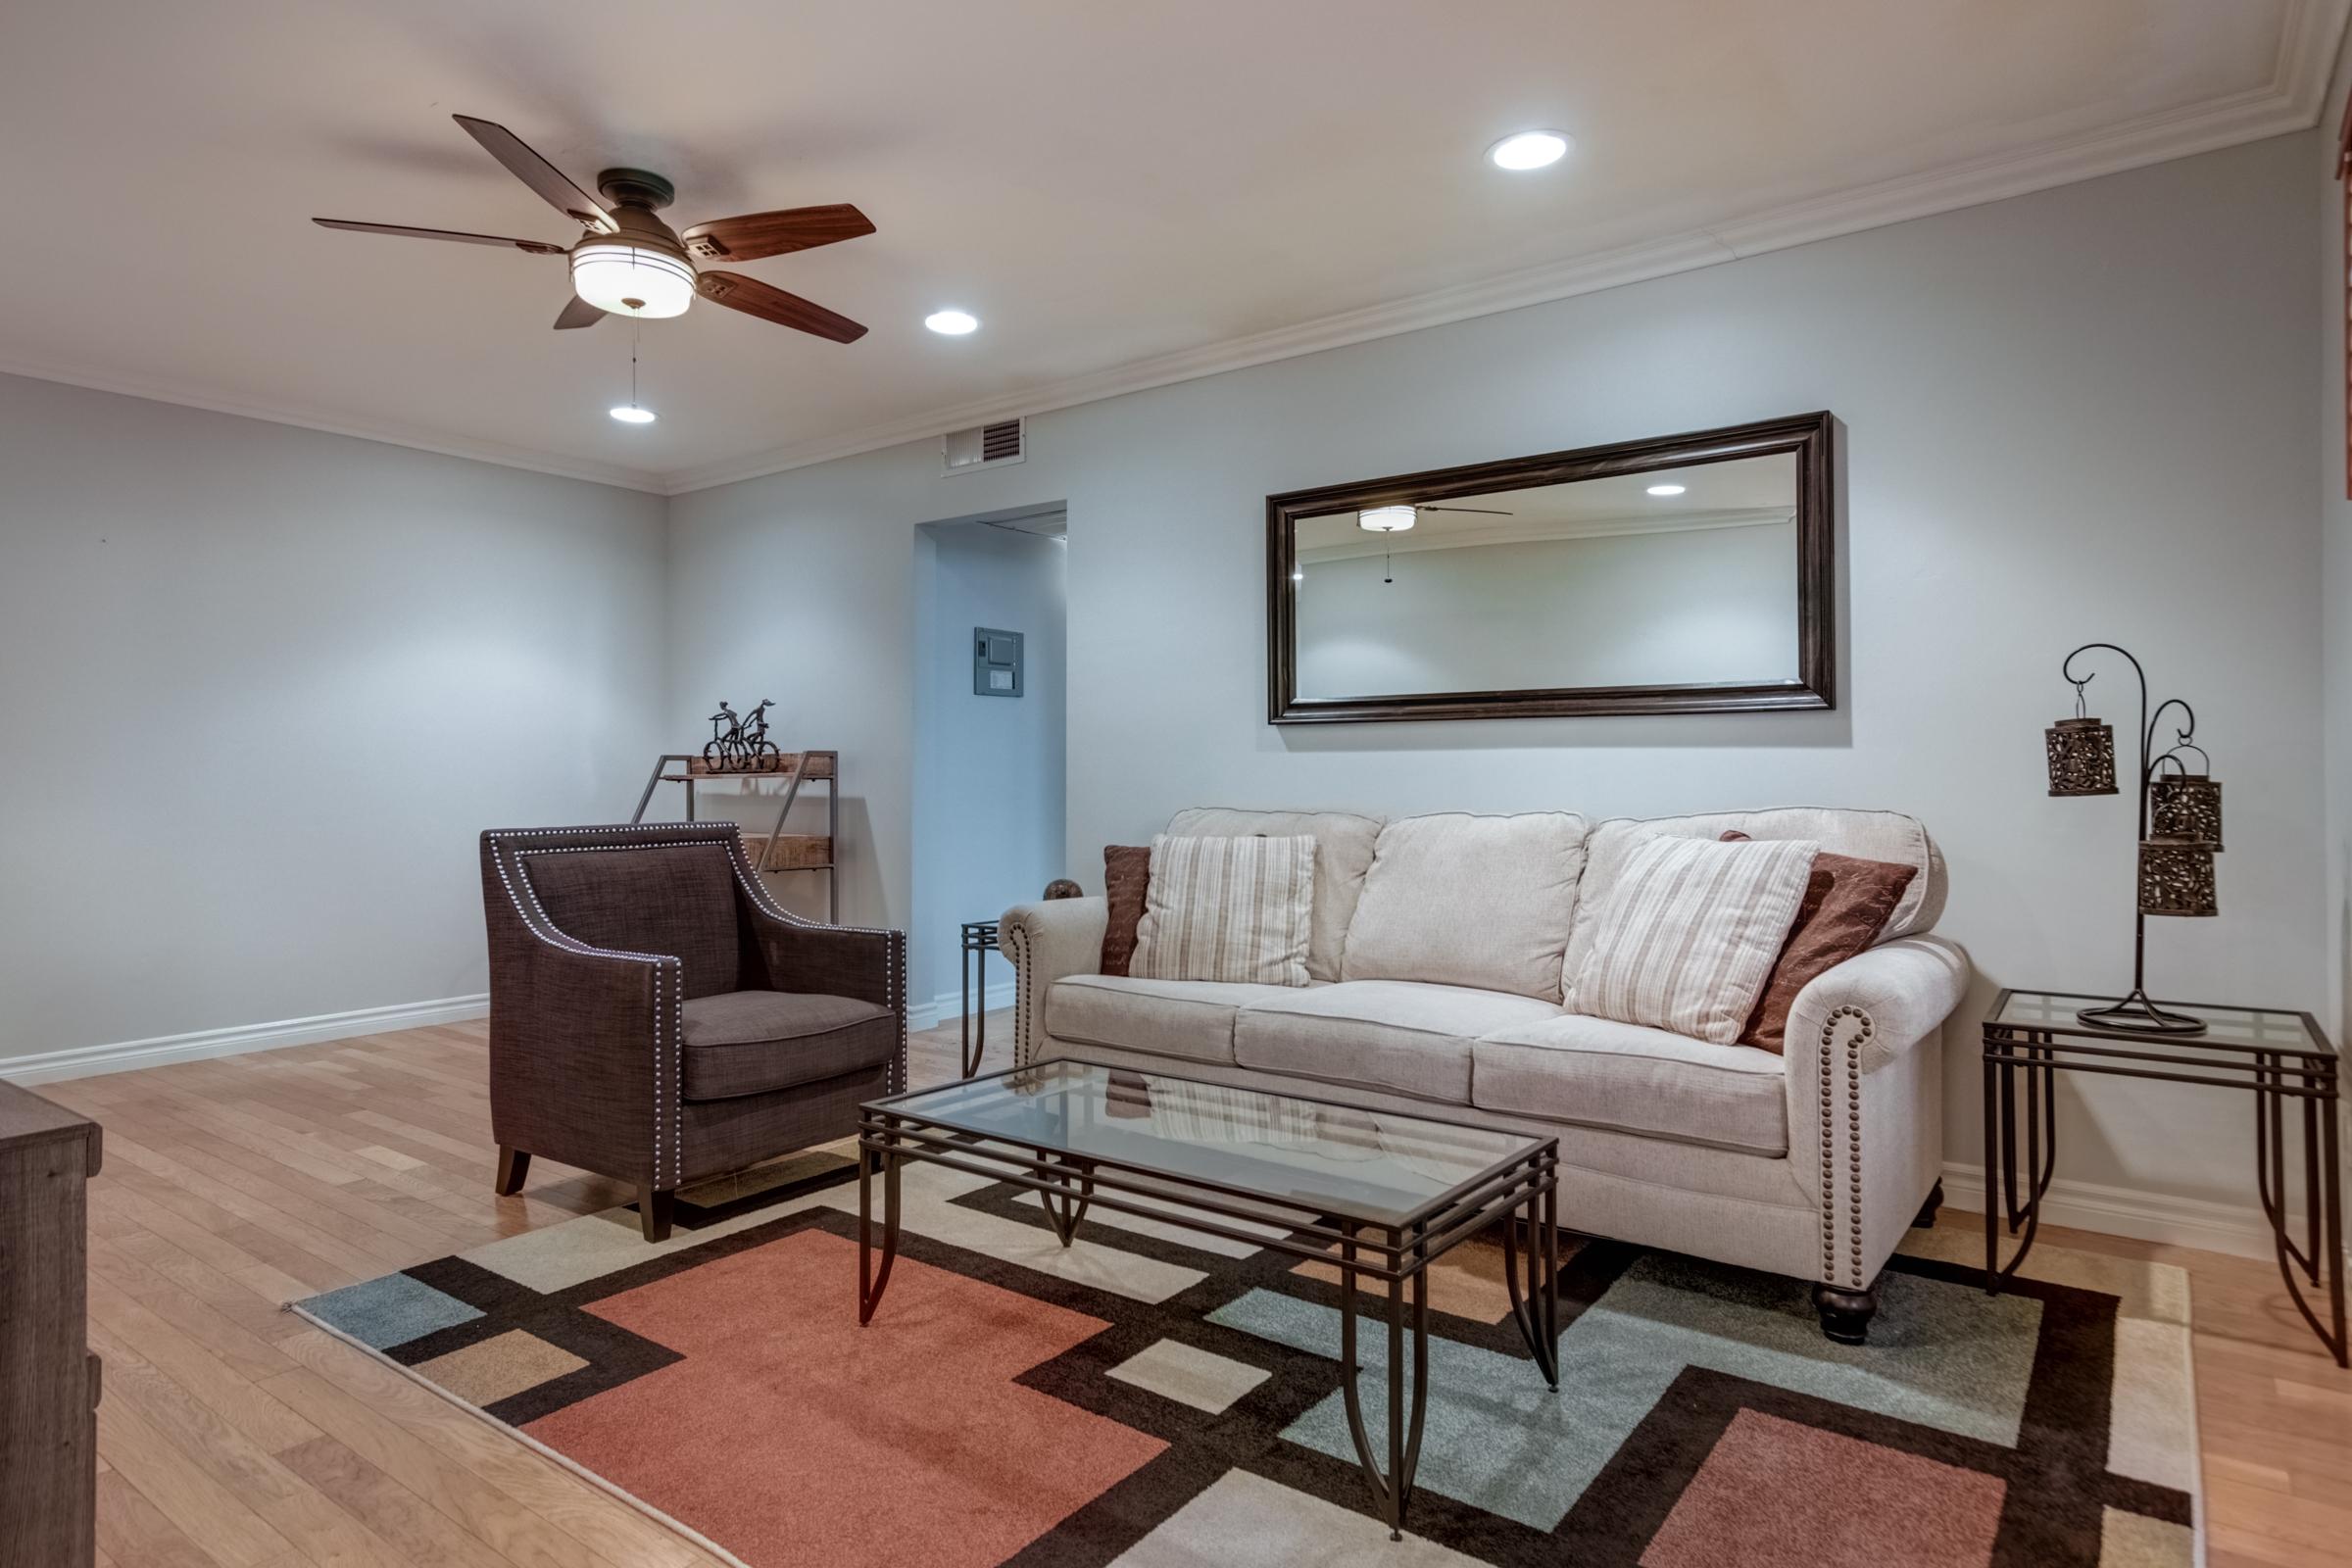 Indian Terrace Condo for Sale Interior